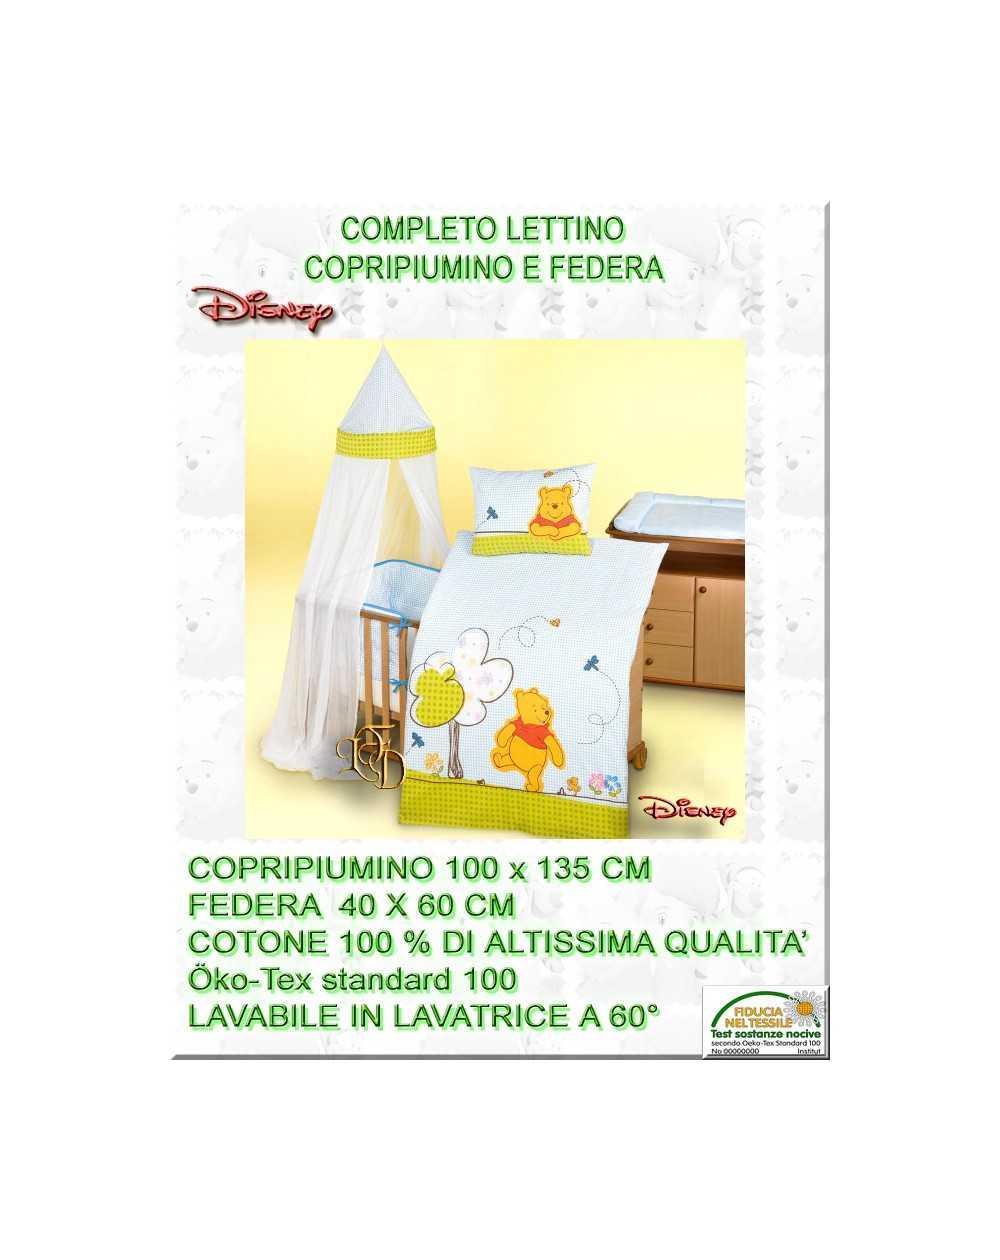 Copripiumino 100x135.Lfd Home